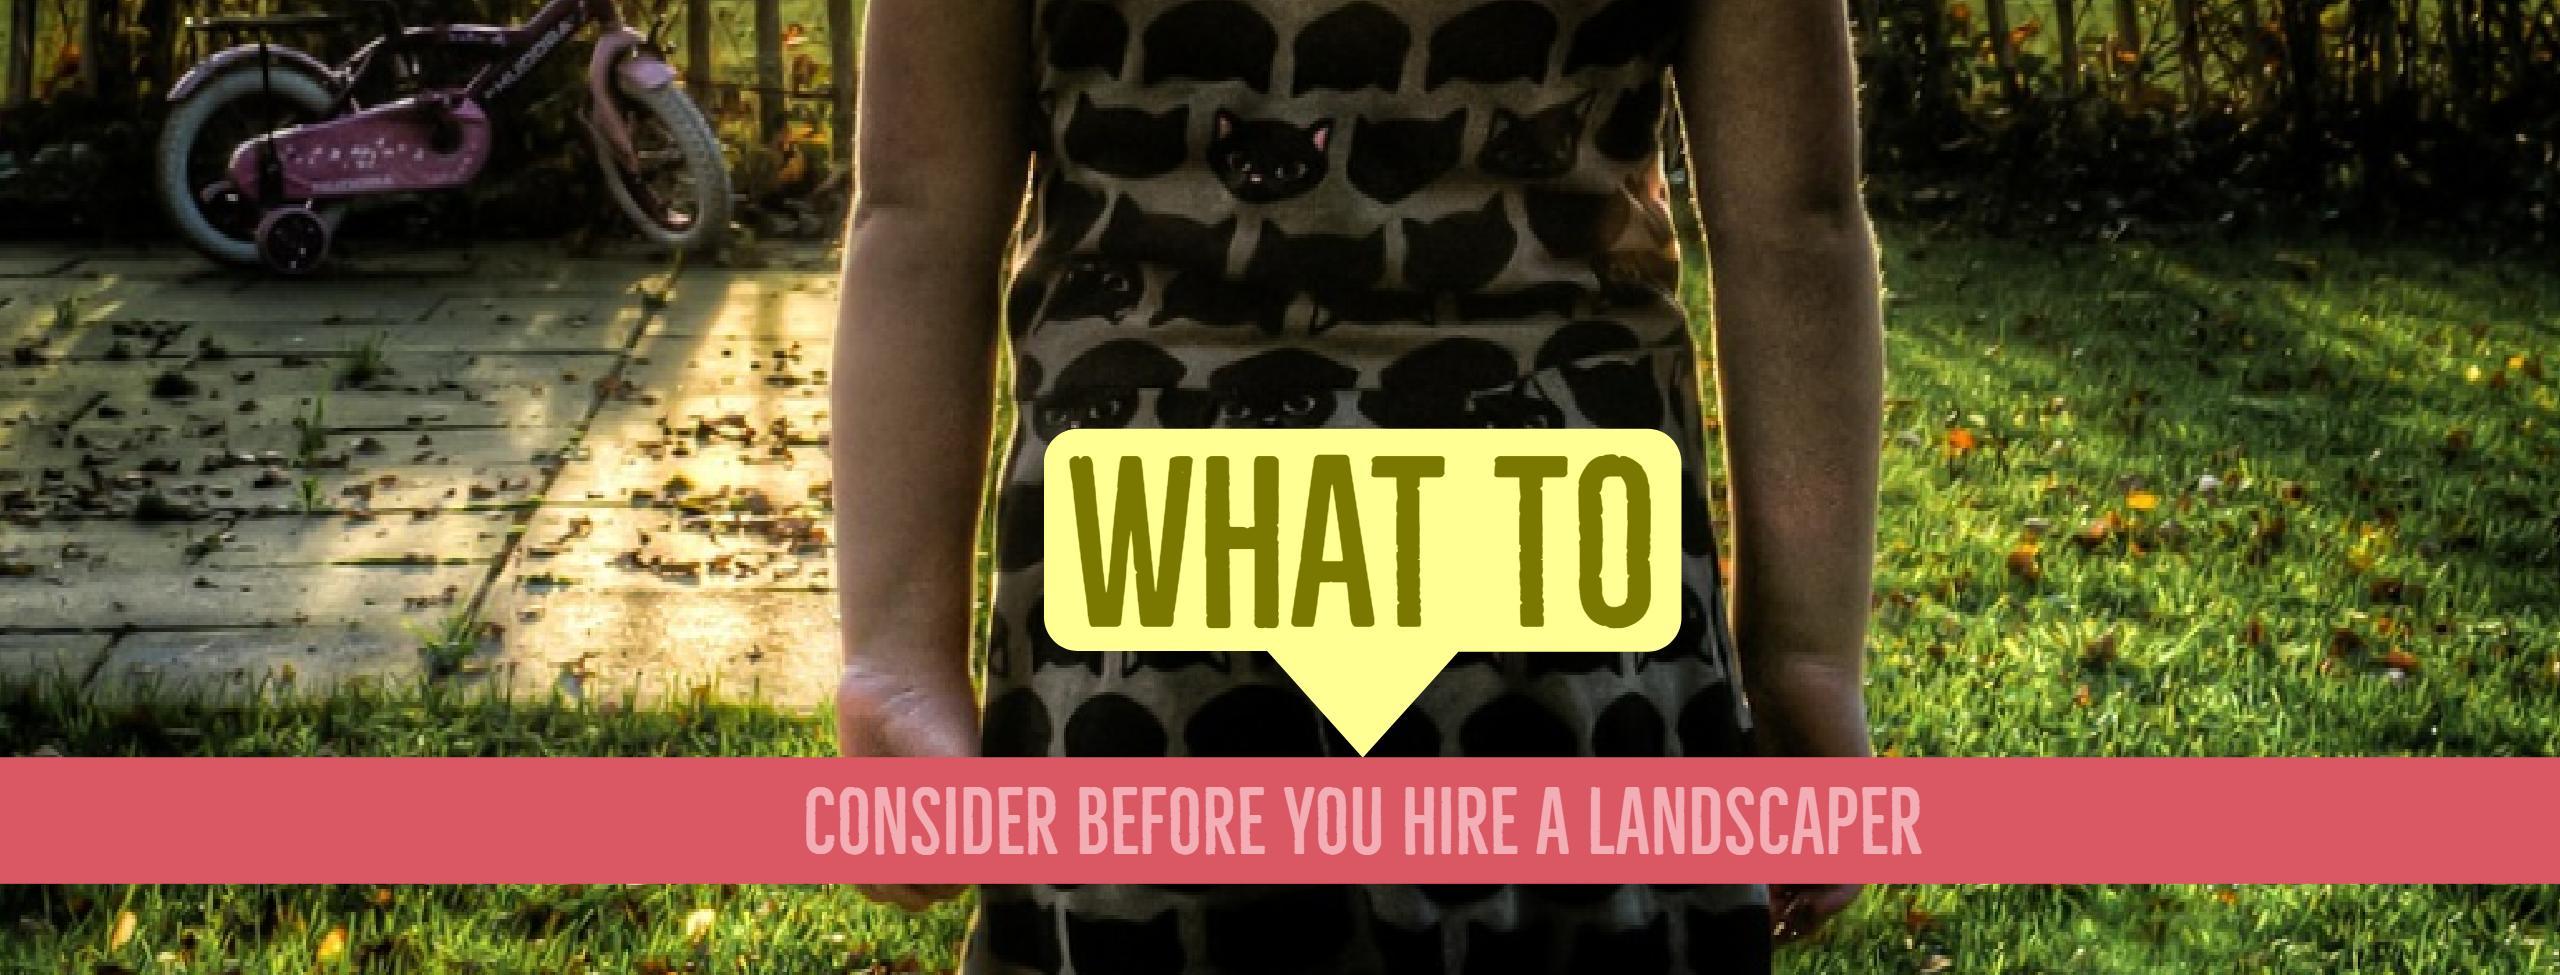 Anne Roberts Gardens hire-a-landscaper